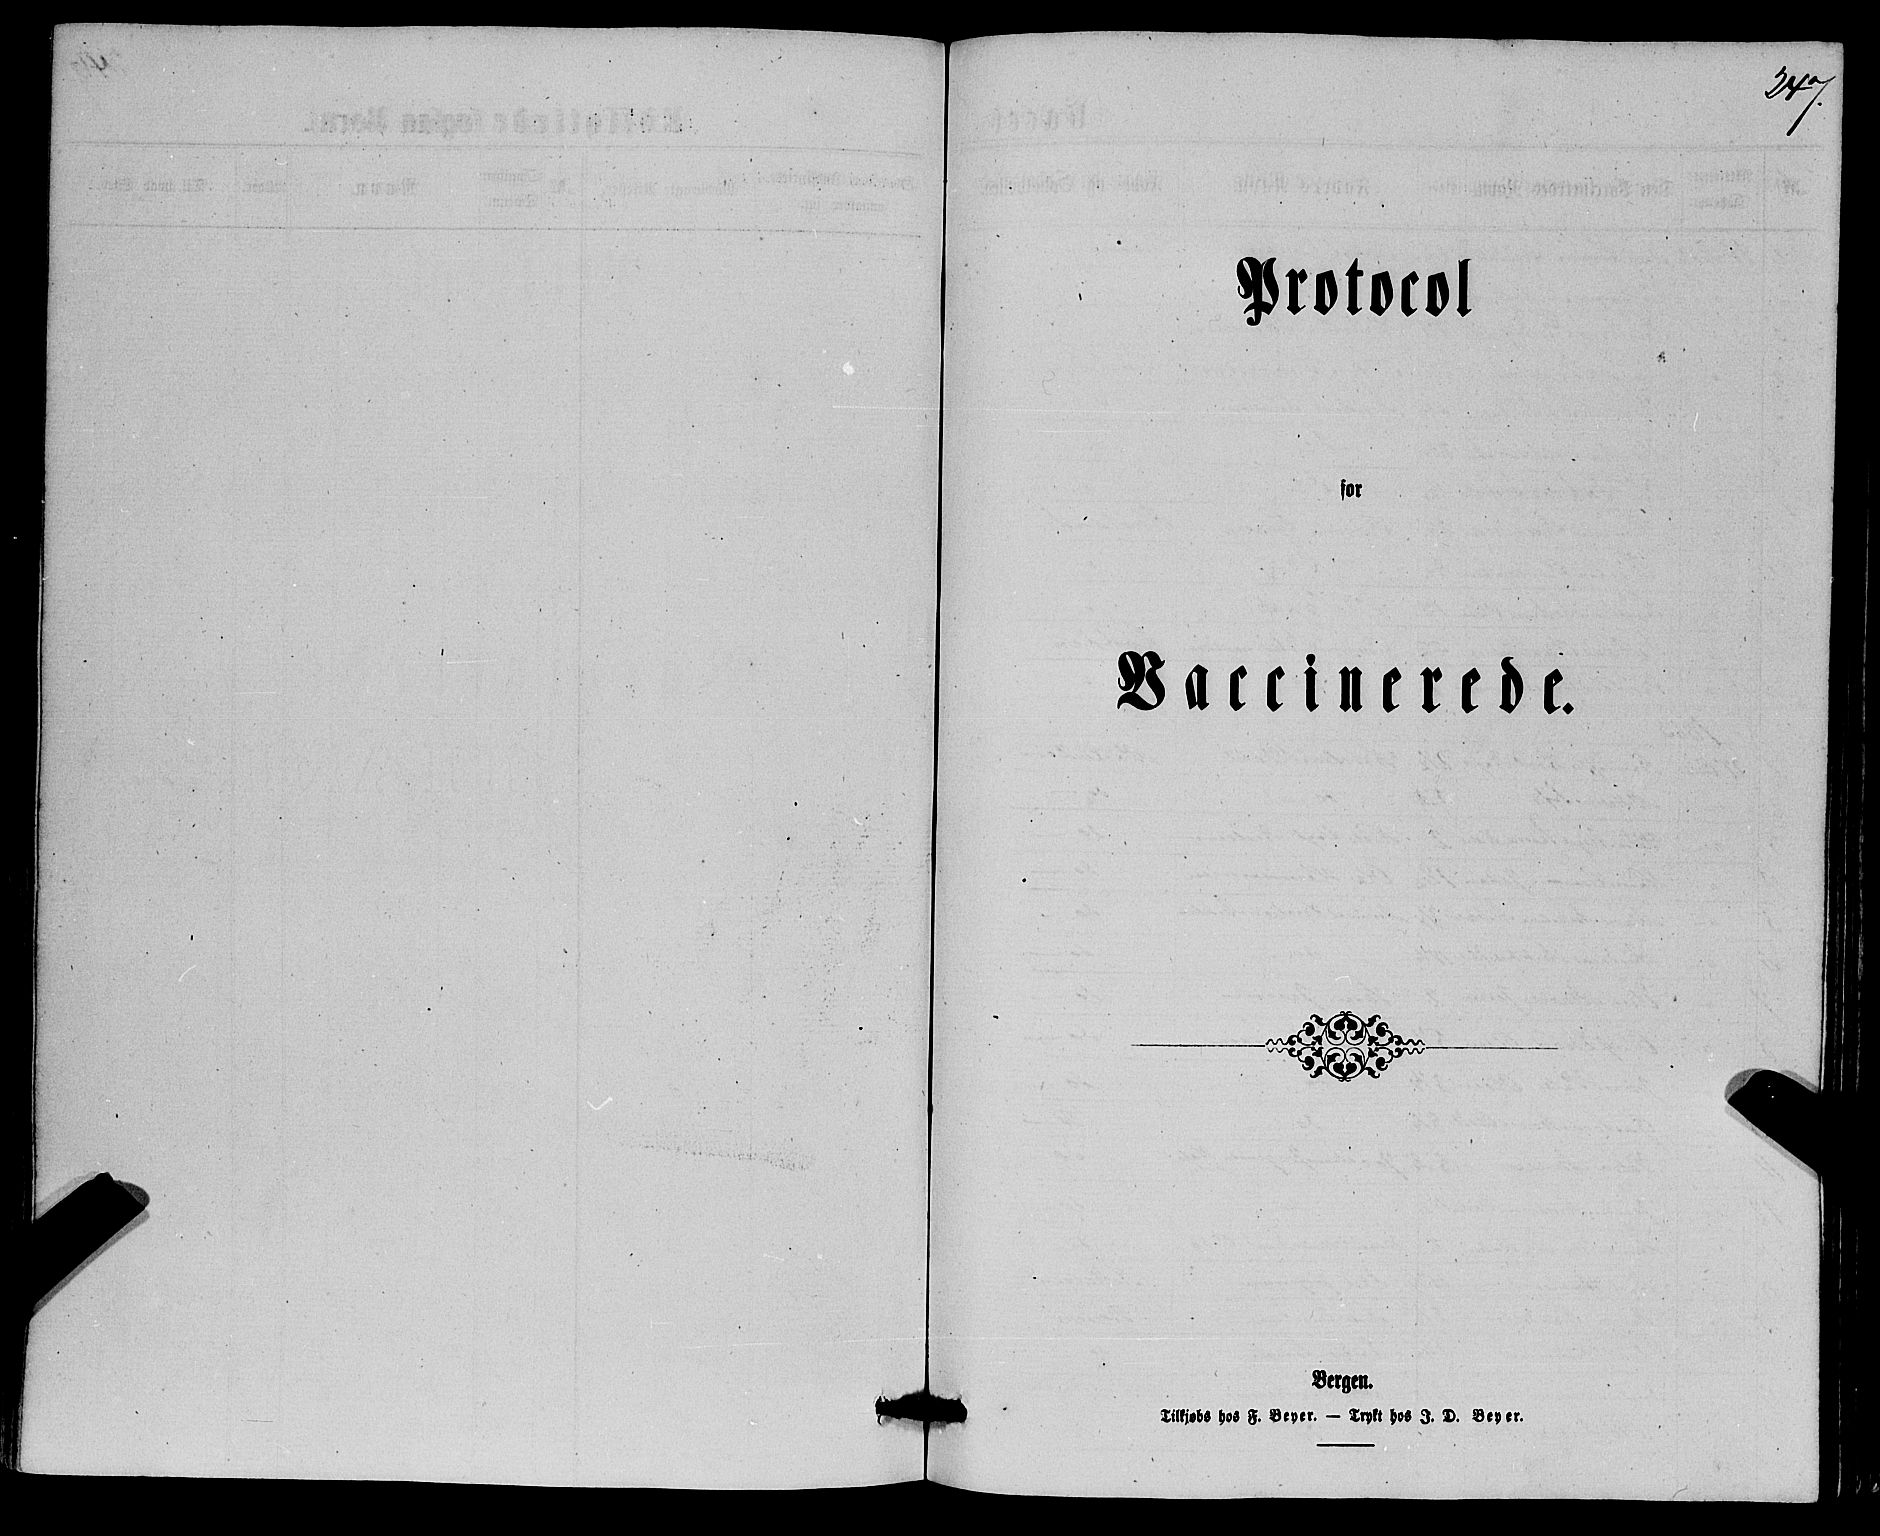 SAB, Finnås sokneprestembete, H/Ha/Haa/Haaa/L0008: Ministerialbok nr. A 8, 1863-1872, s. 247